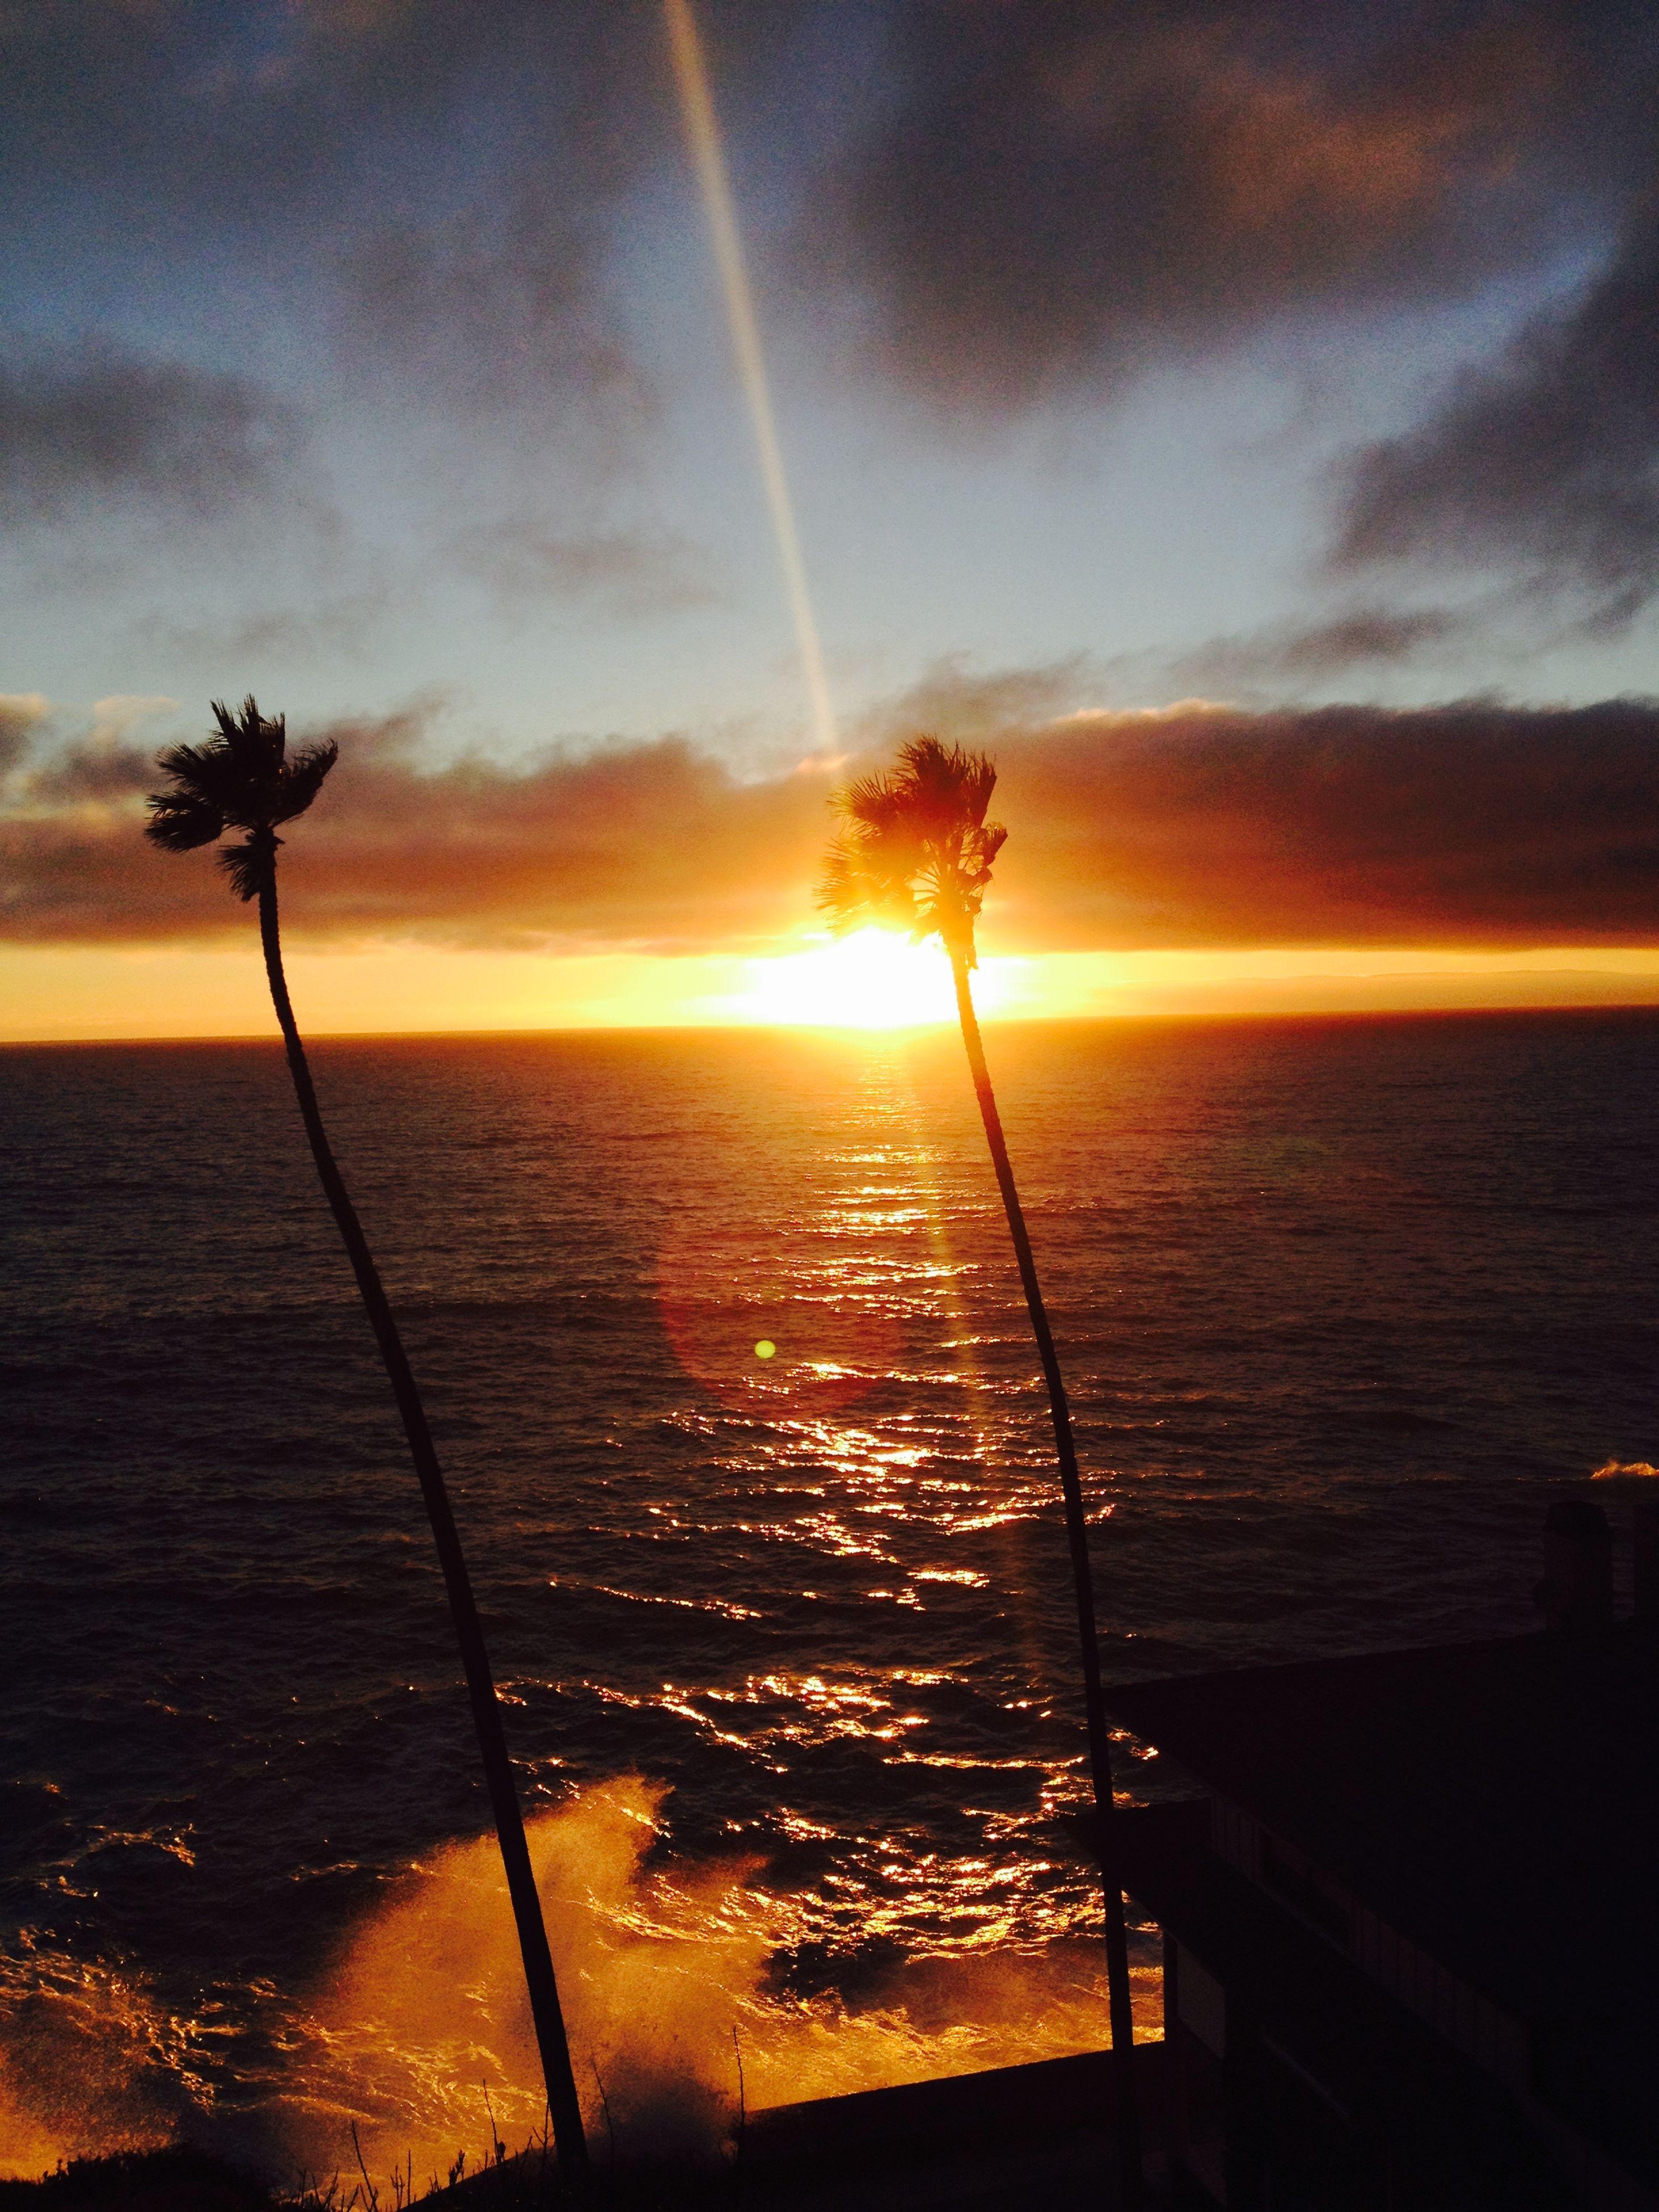 sunset, water, sea, sun, horizon over water, sky, scenics, beauty in nature, tranquil scene, tranquility, orange color, nature, idyllic, reflection, cloud - sky, beach, sunlight, silhouette, sunbeam, cloud